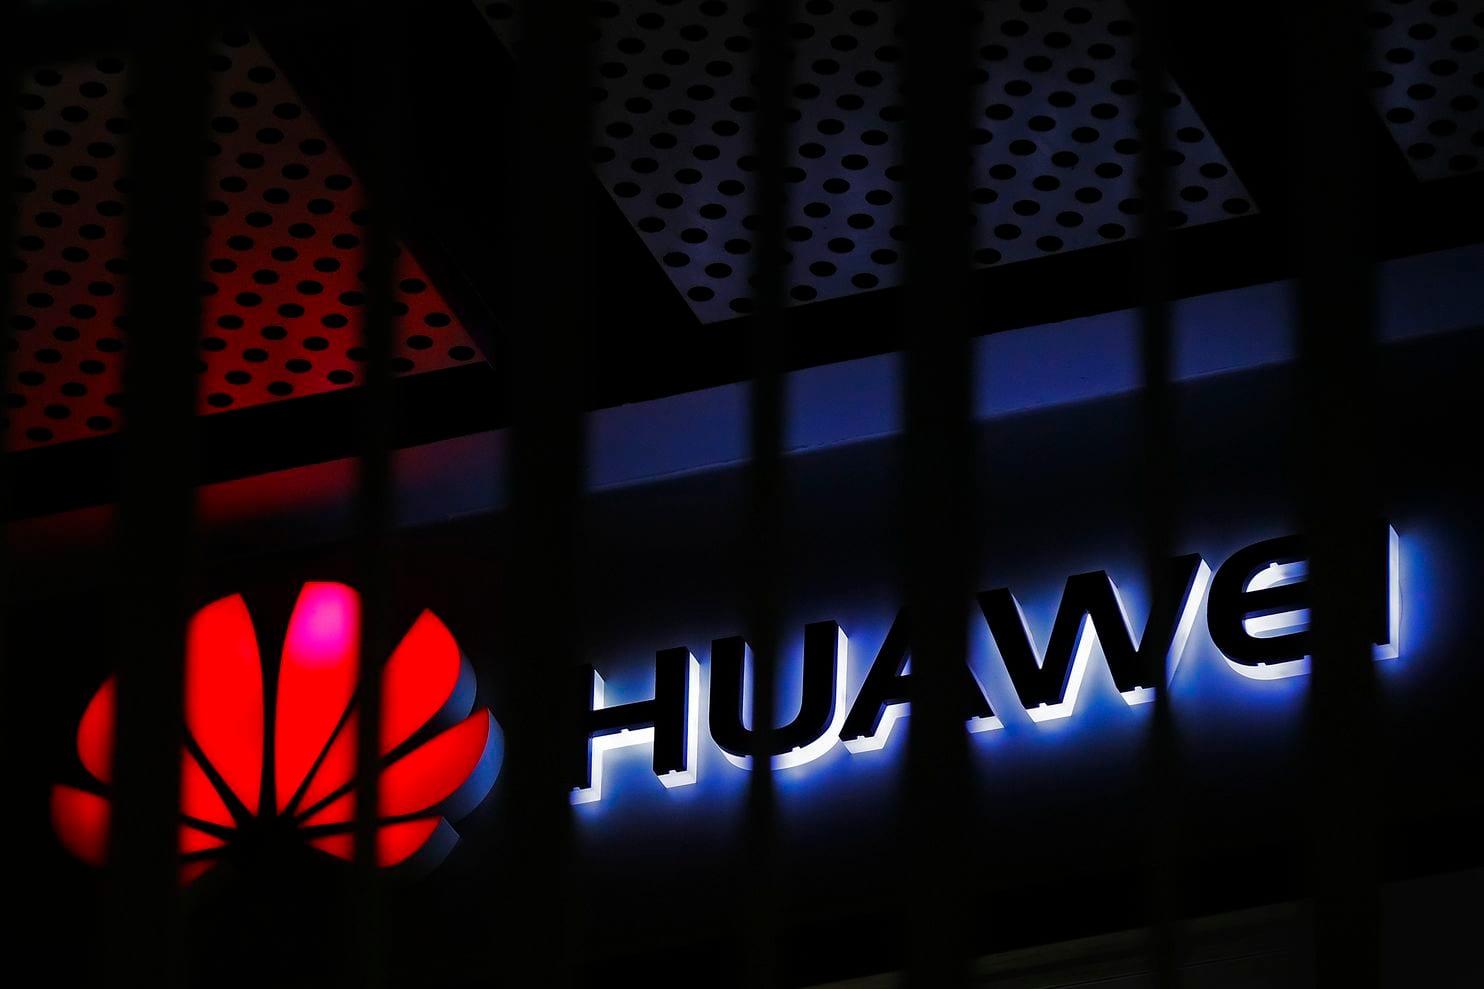 Huawei, il ban degli USA potrebbe far bene alla Cina